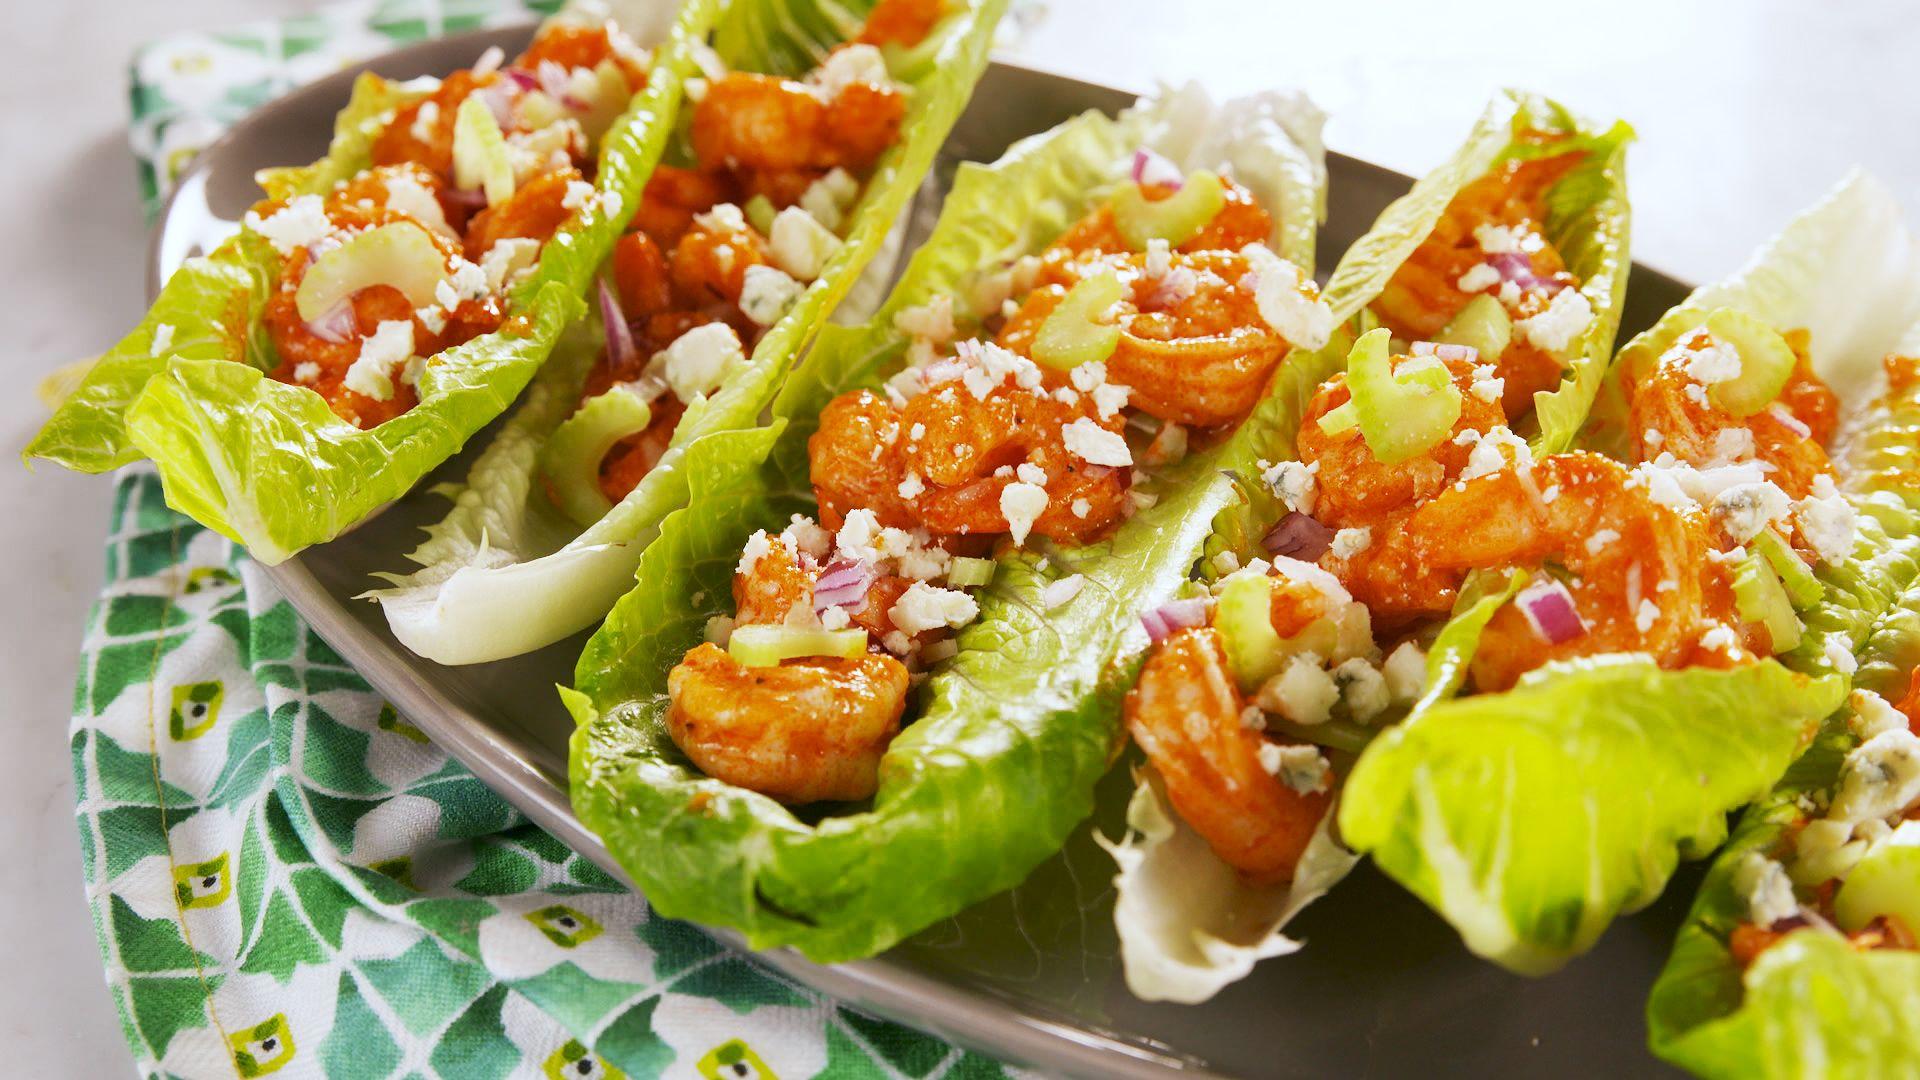 Shrimp And Lettuce Wraps-6888